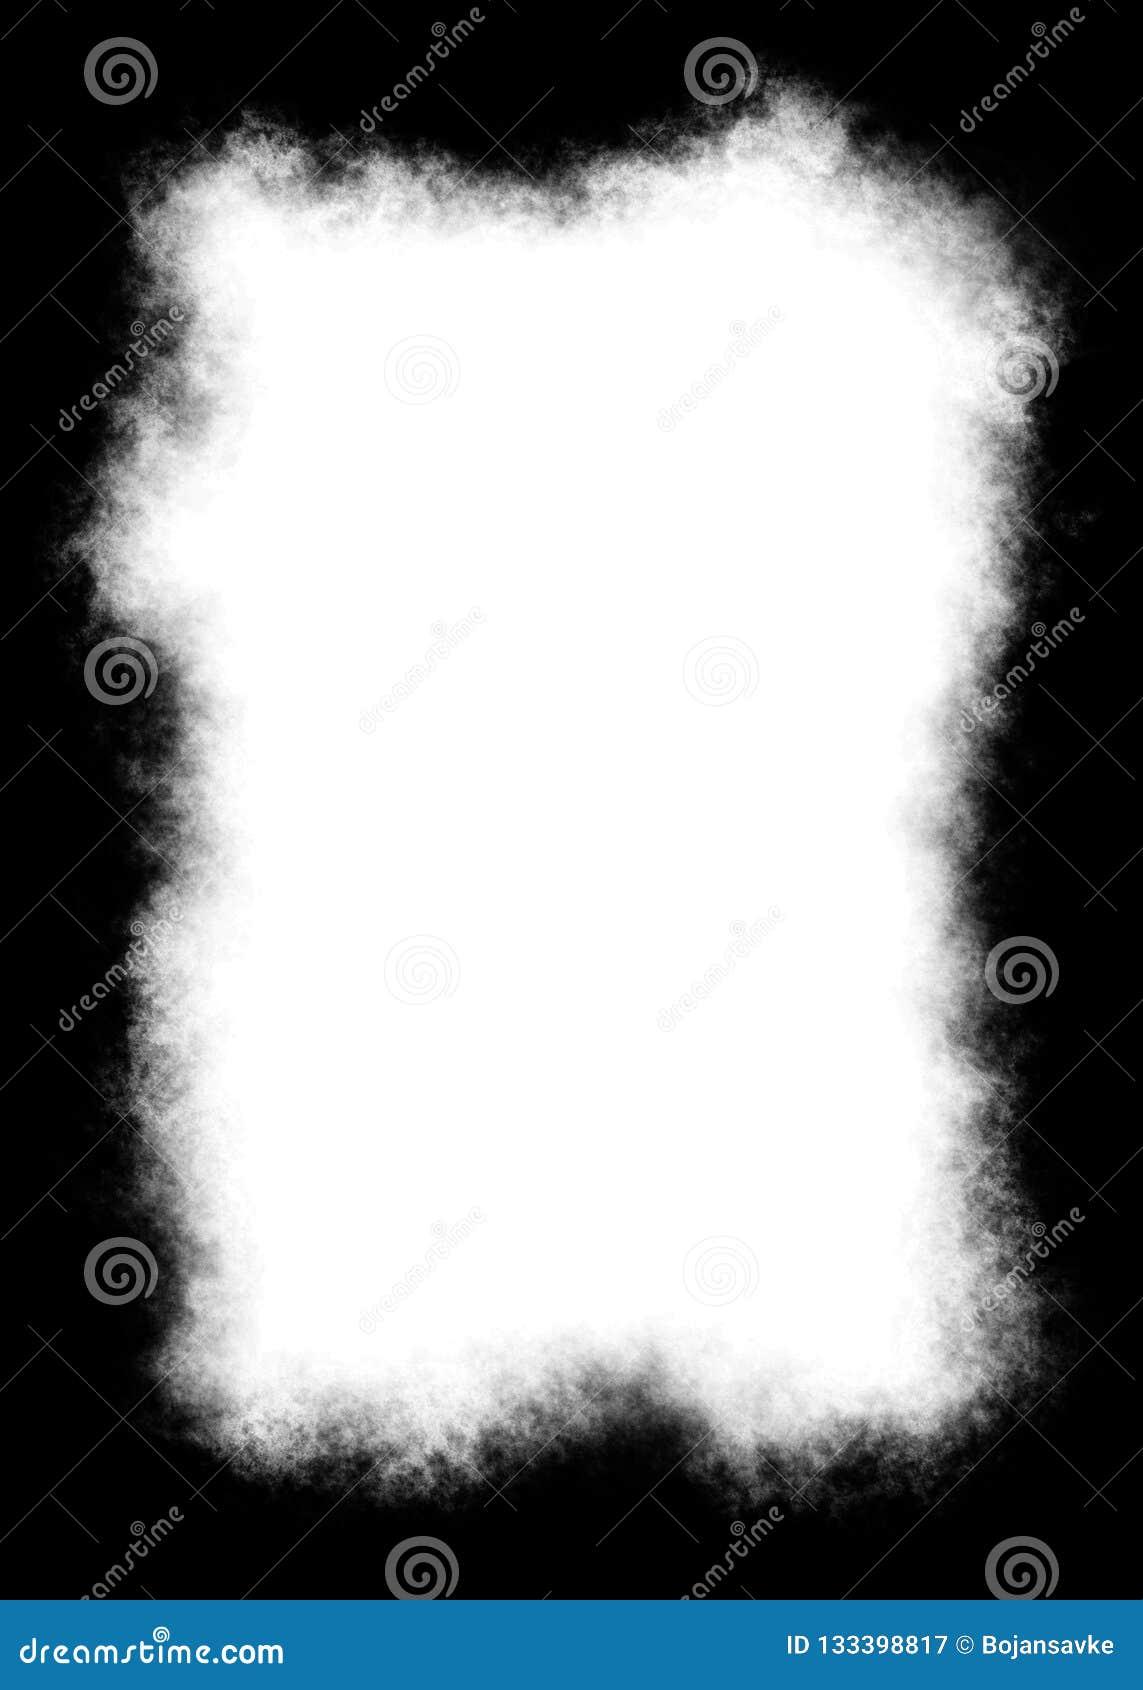 Abstract Decorative Black Photo Edge/Overlay for Portrait Photos